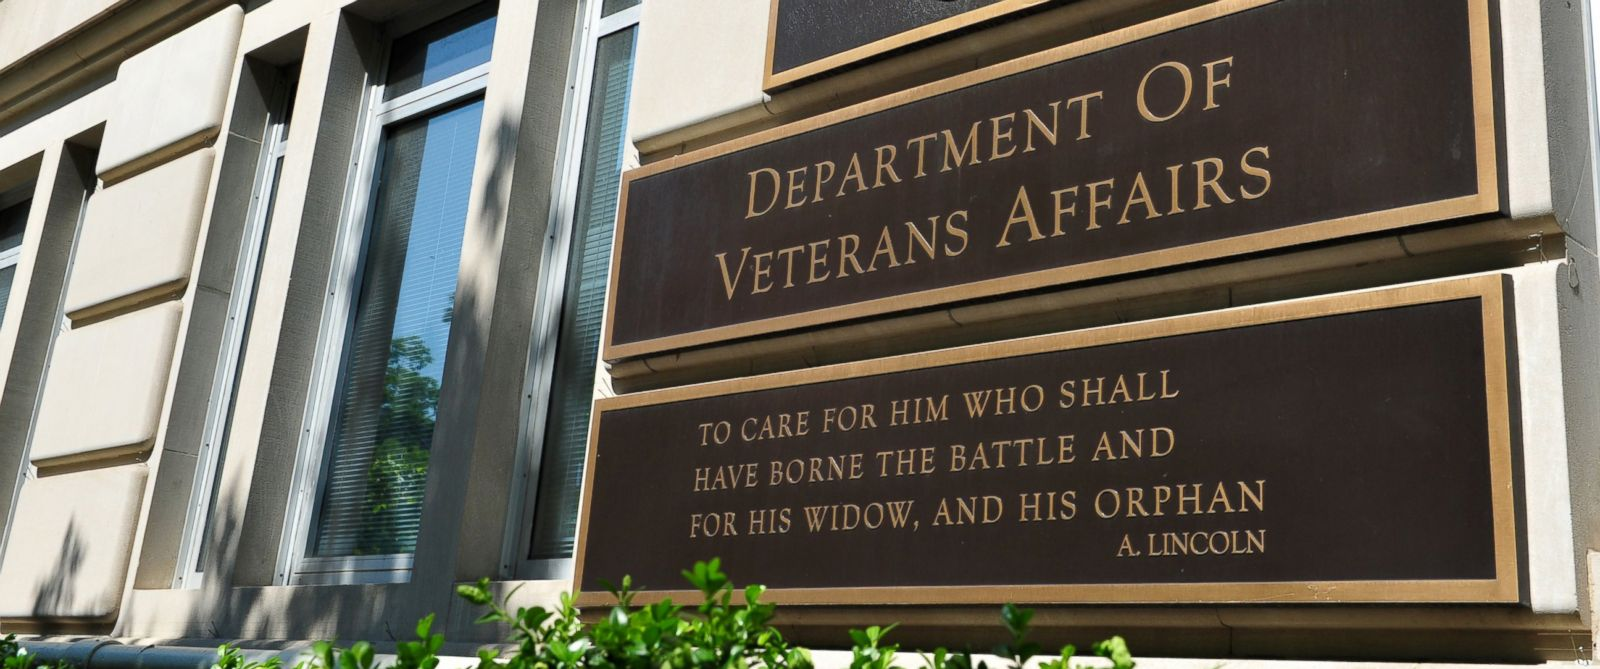 PHOTO: The Veterans Affairs building in Washington, DC.